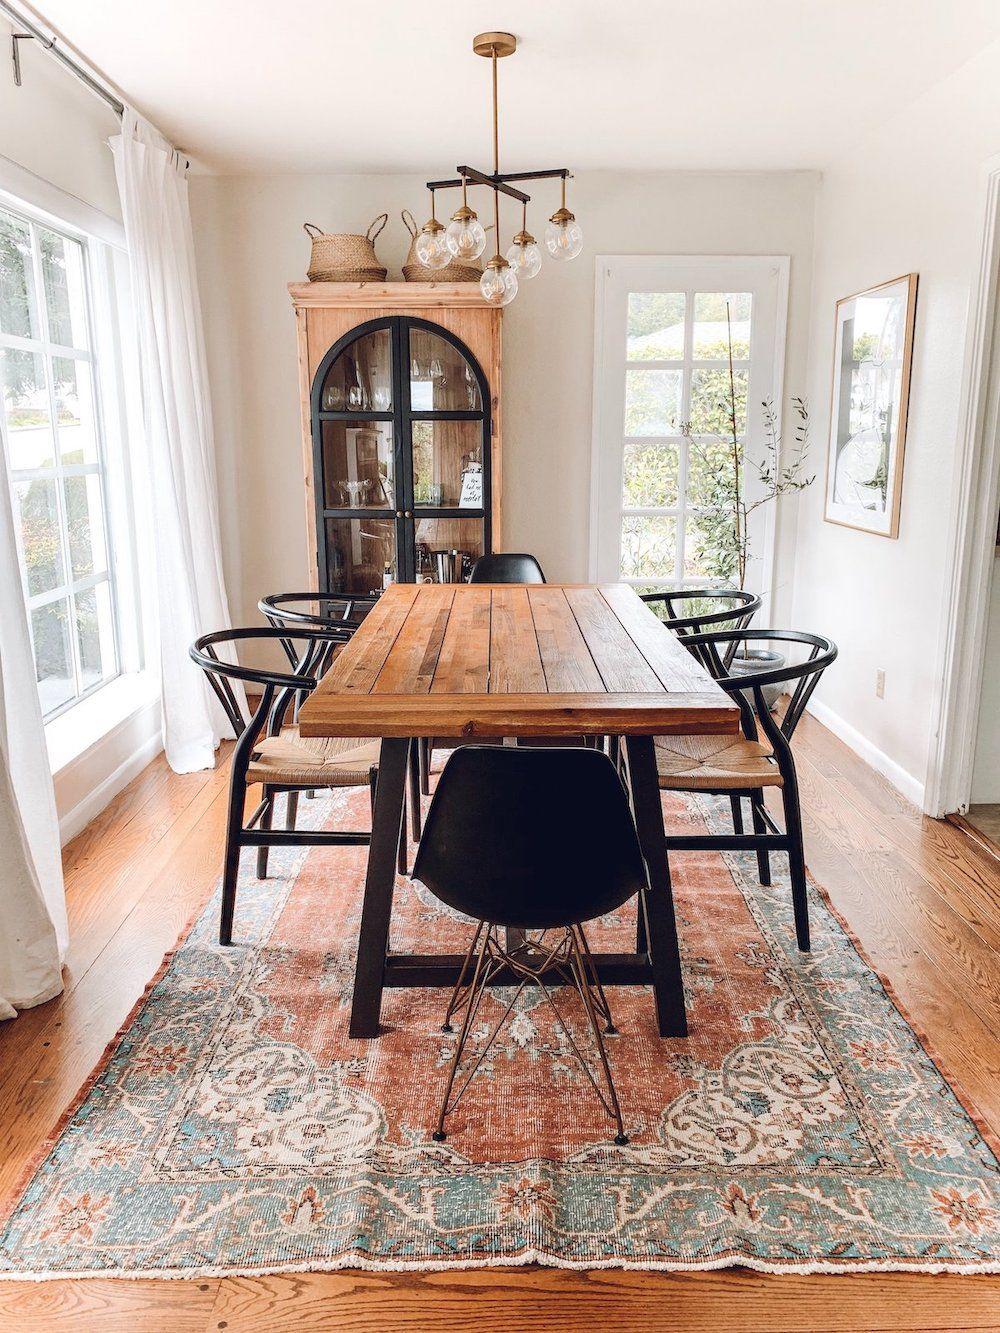 12 Chic Scandinavian Dining Rooms